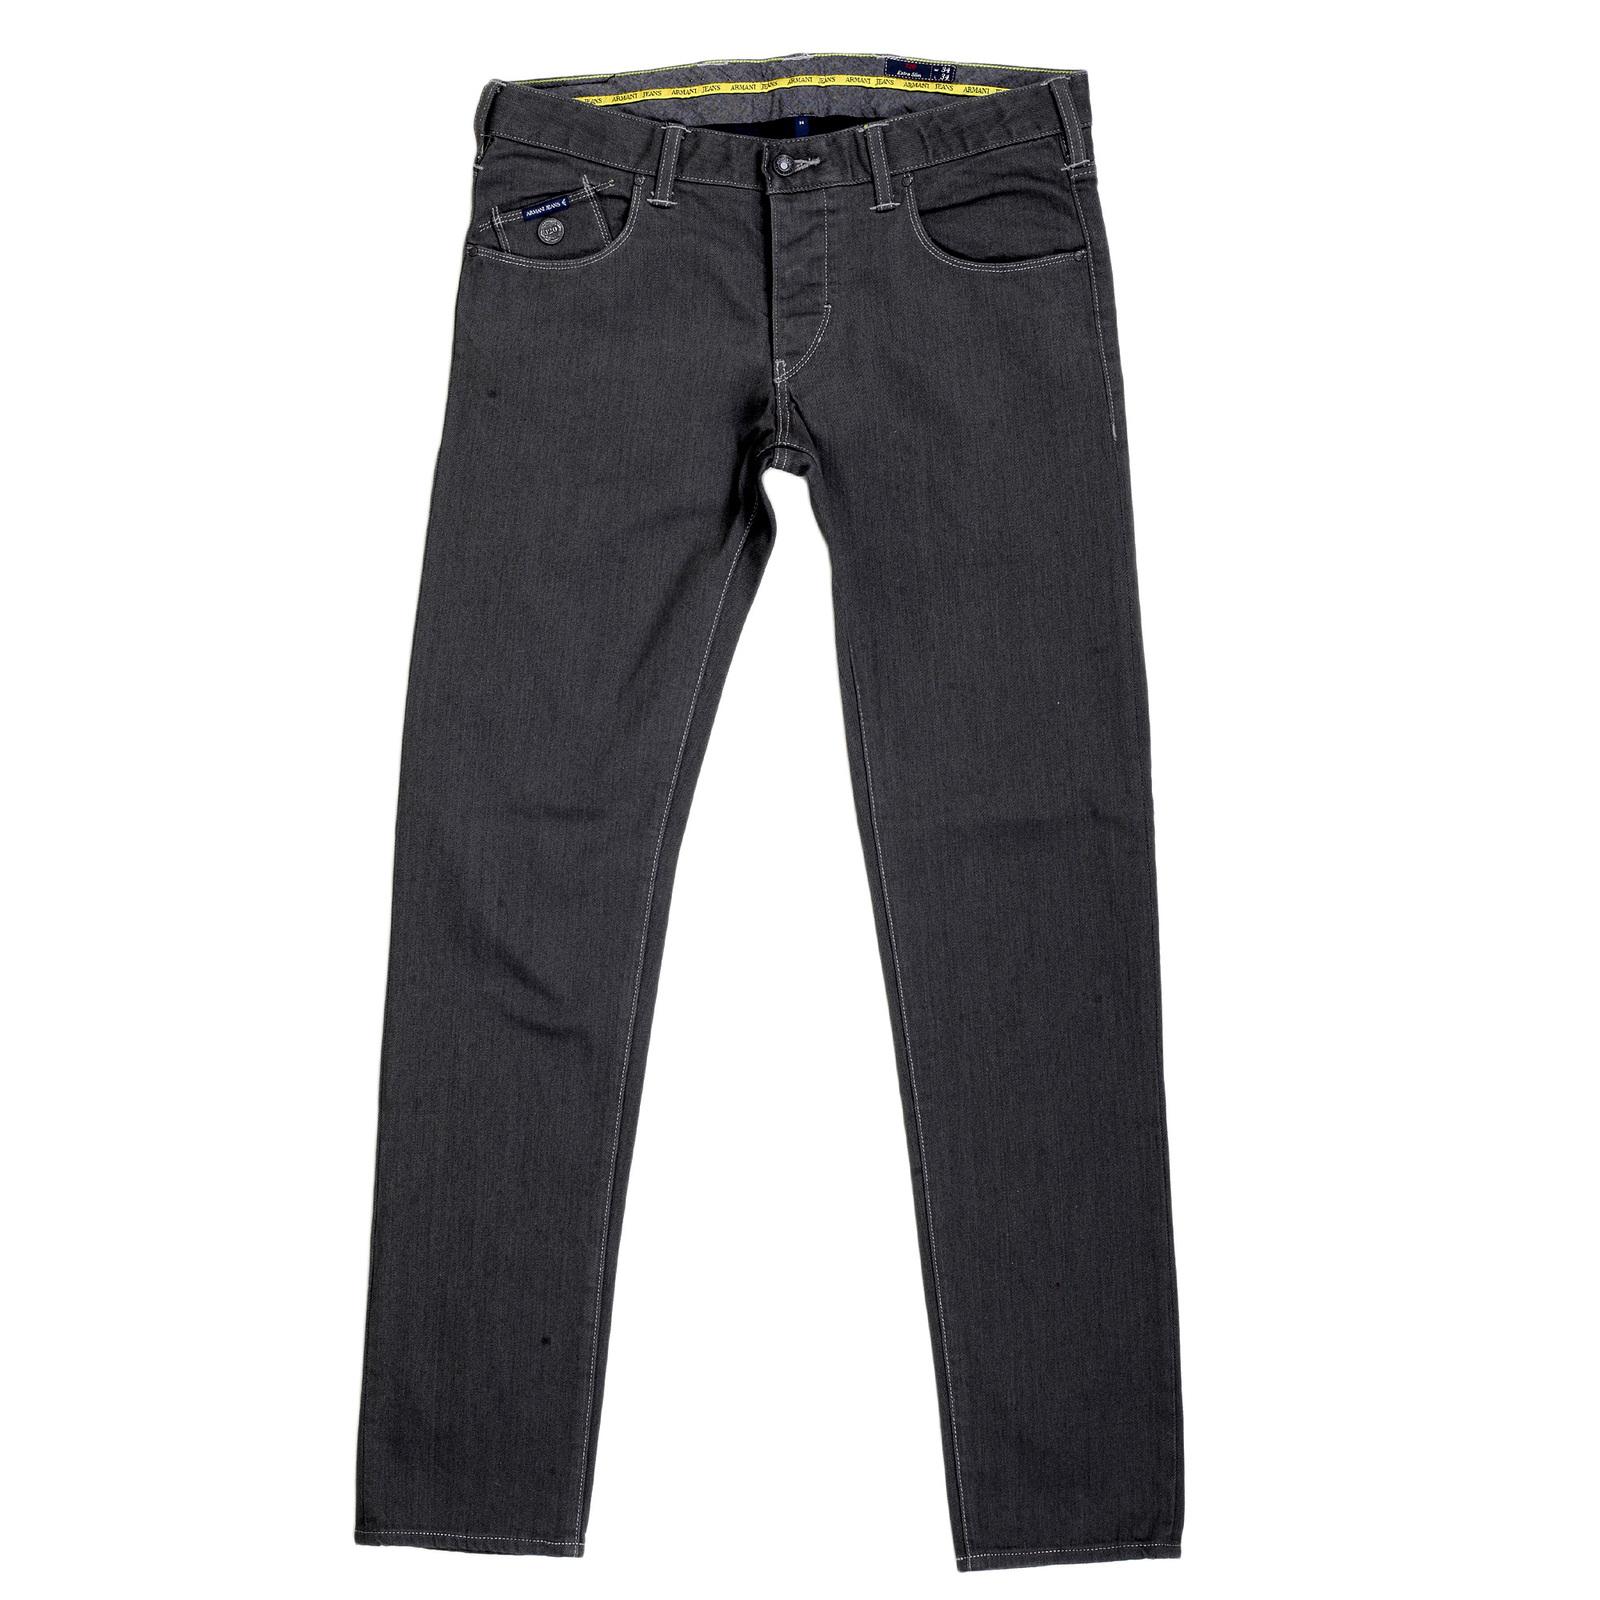 slim fit low waist mens grey jeans from armani jeans uk. Black Bedroom Furniture Sets. Home Design Ideas